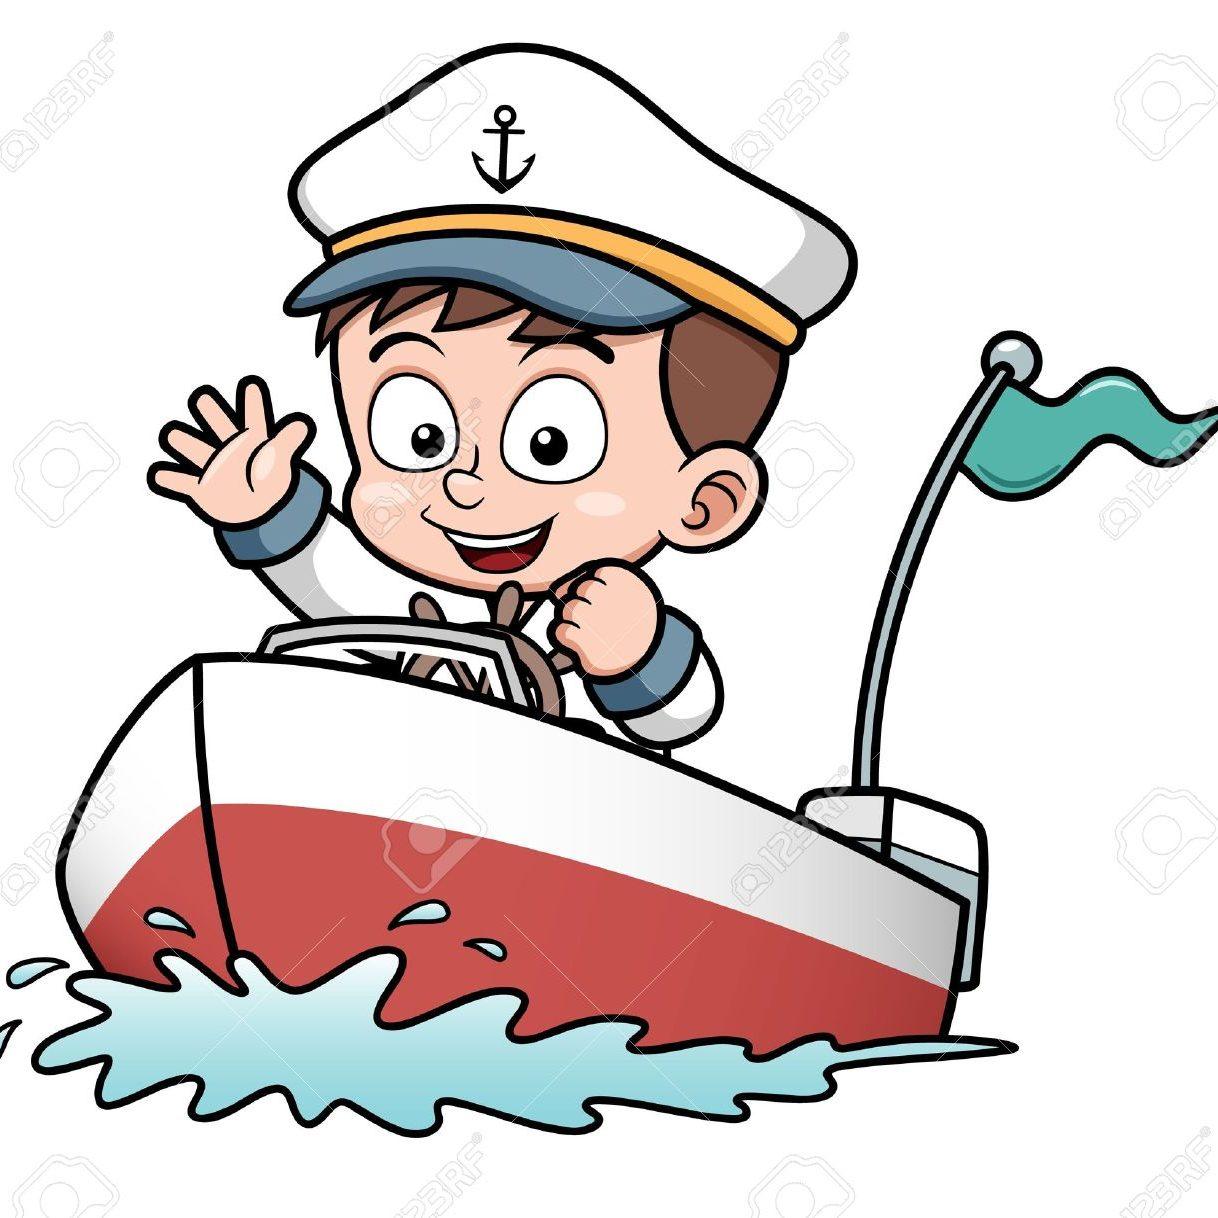 boy-driving-boat